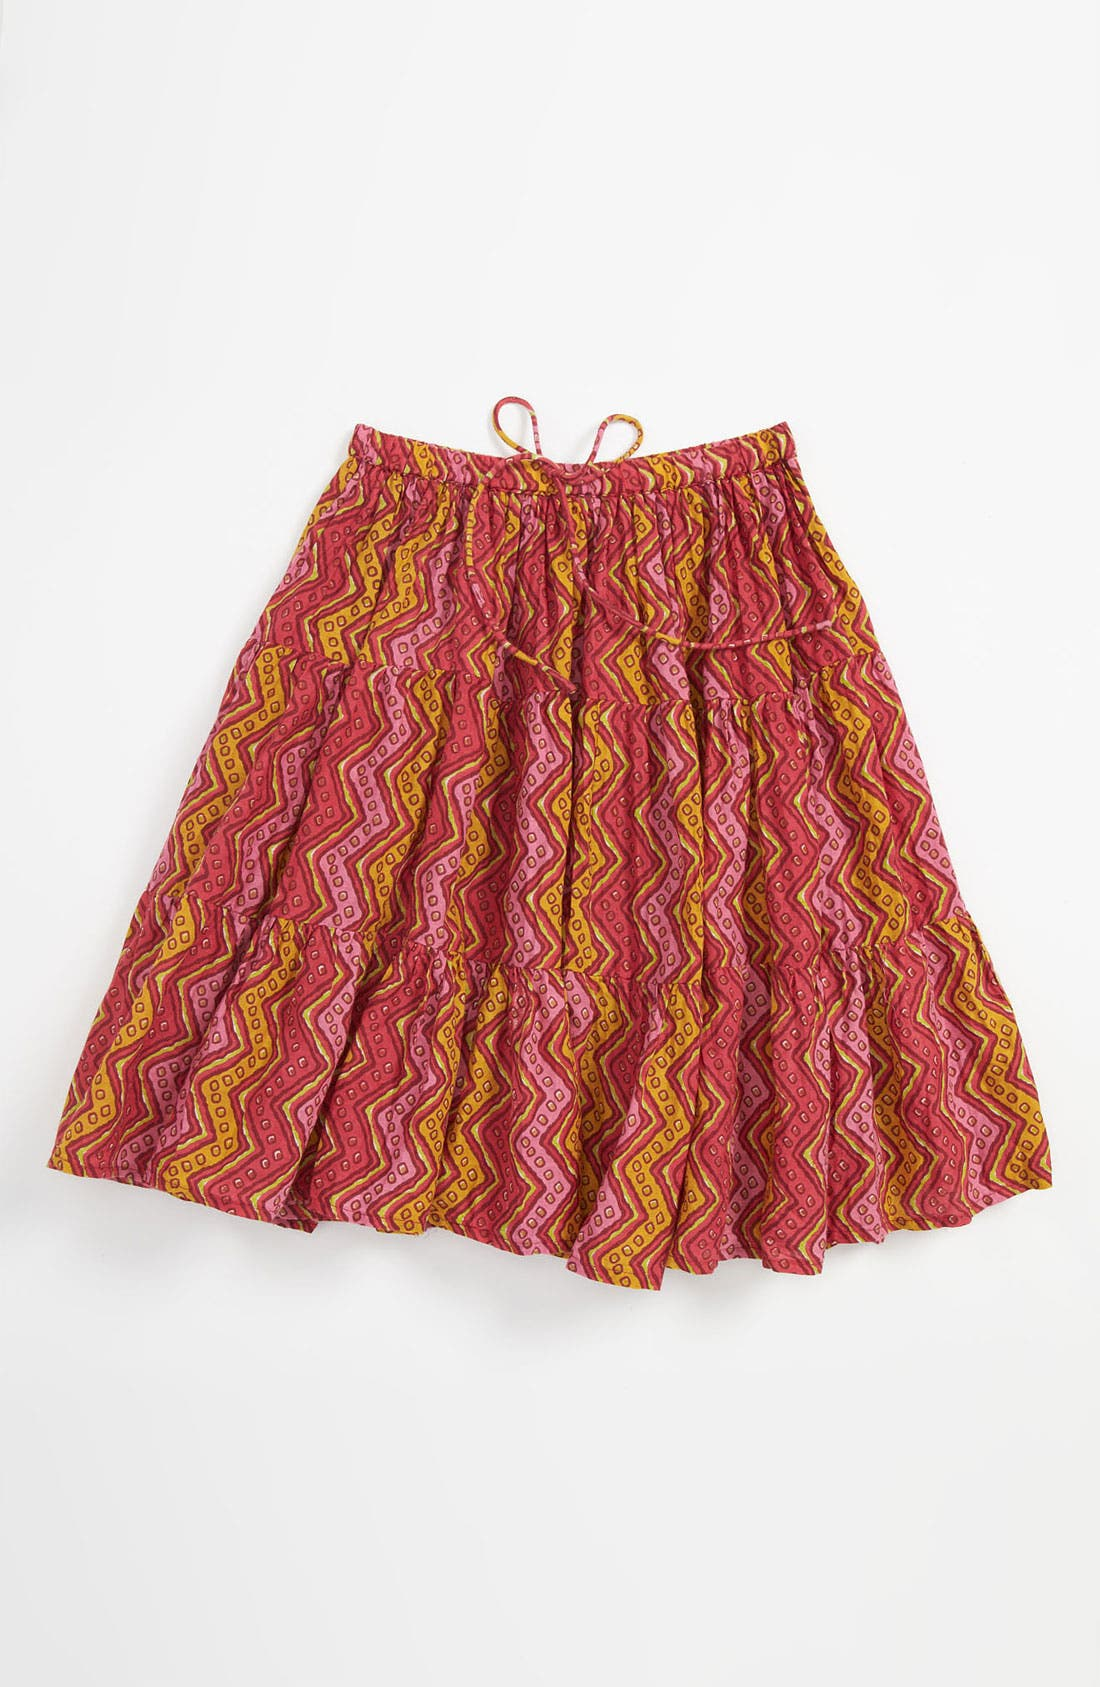 Main Image - Peek 'Milly' Skirt (Toddler, Little Girls & Big Girls)